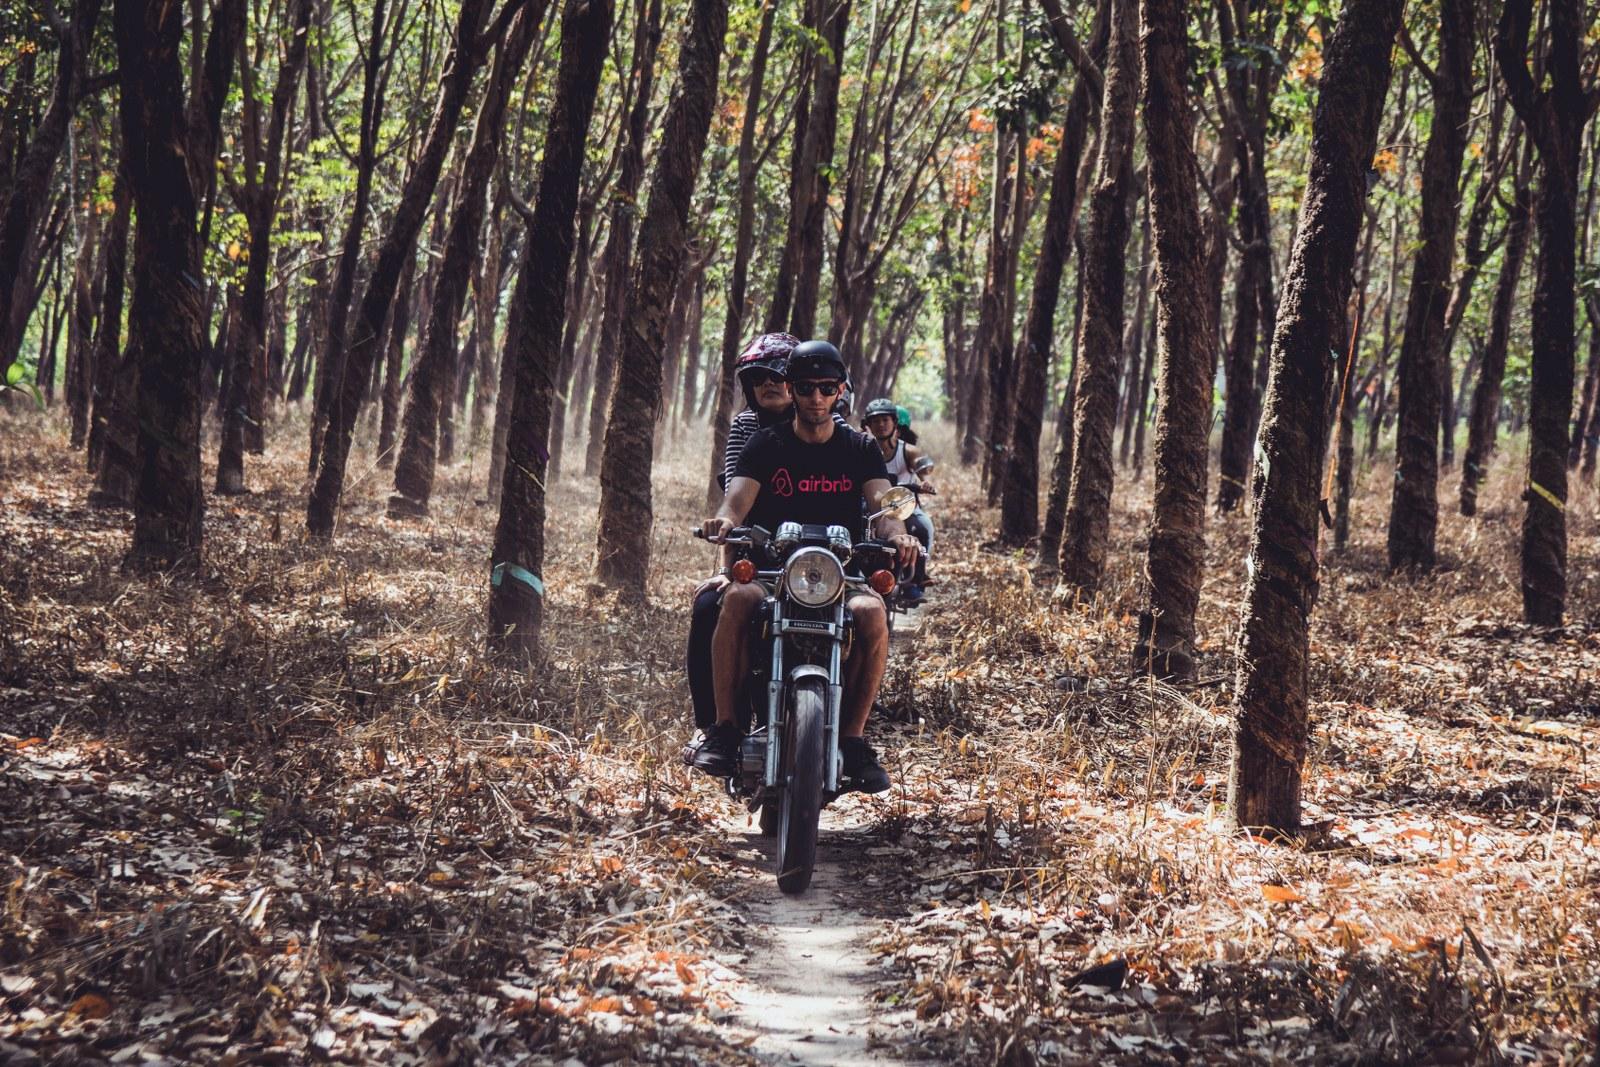 cu chi tunnels motorbike tour half day